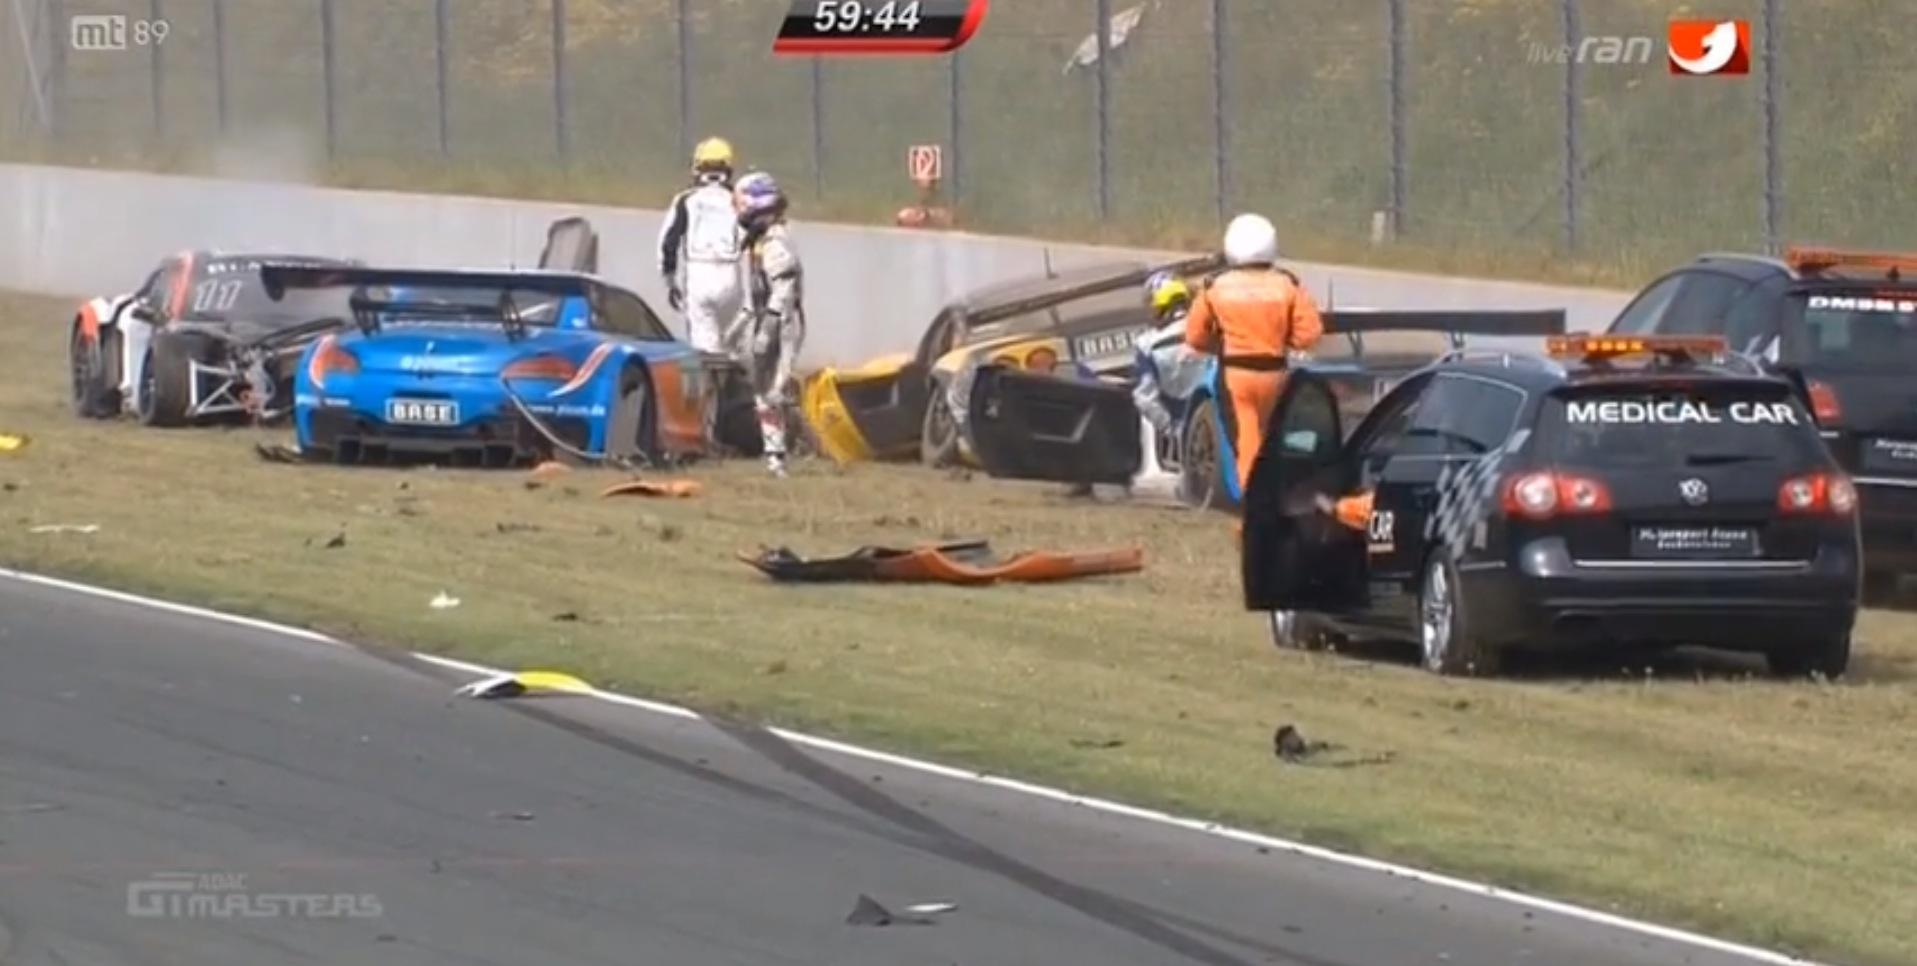 Massive Crash Destroys 6 Cars in ADAC GT Masters Race - autoevolution